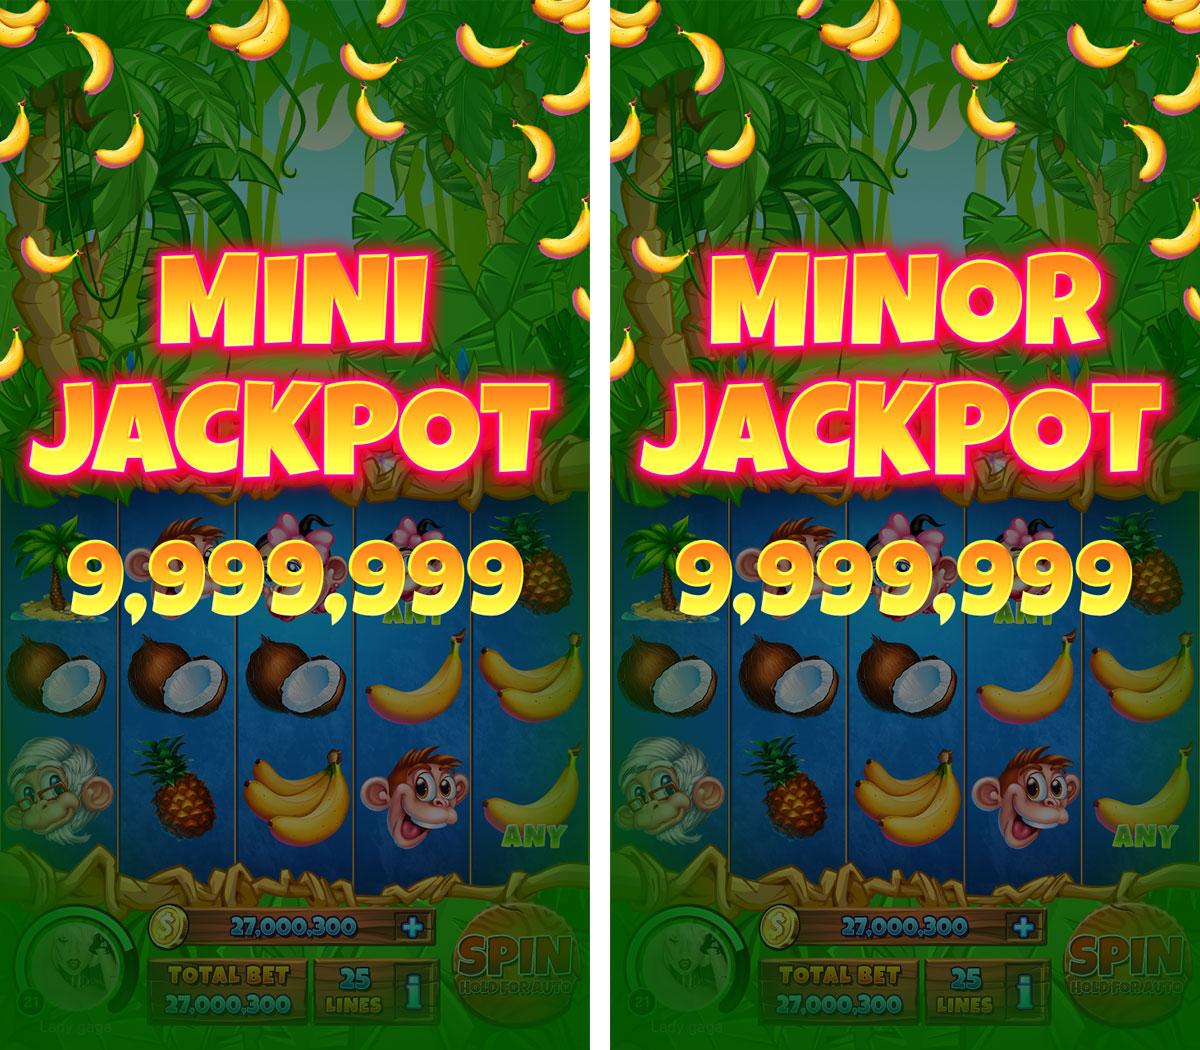 monkey_jackpot_blog_jackpots-1